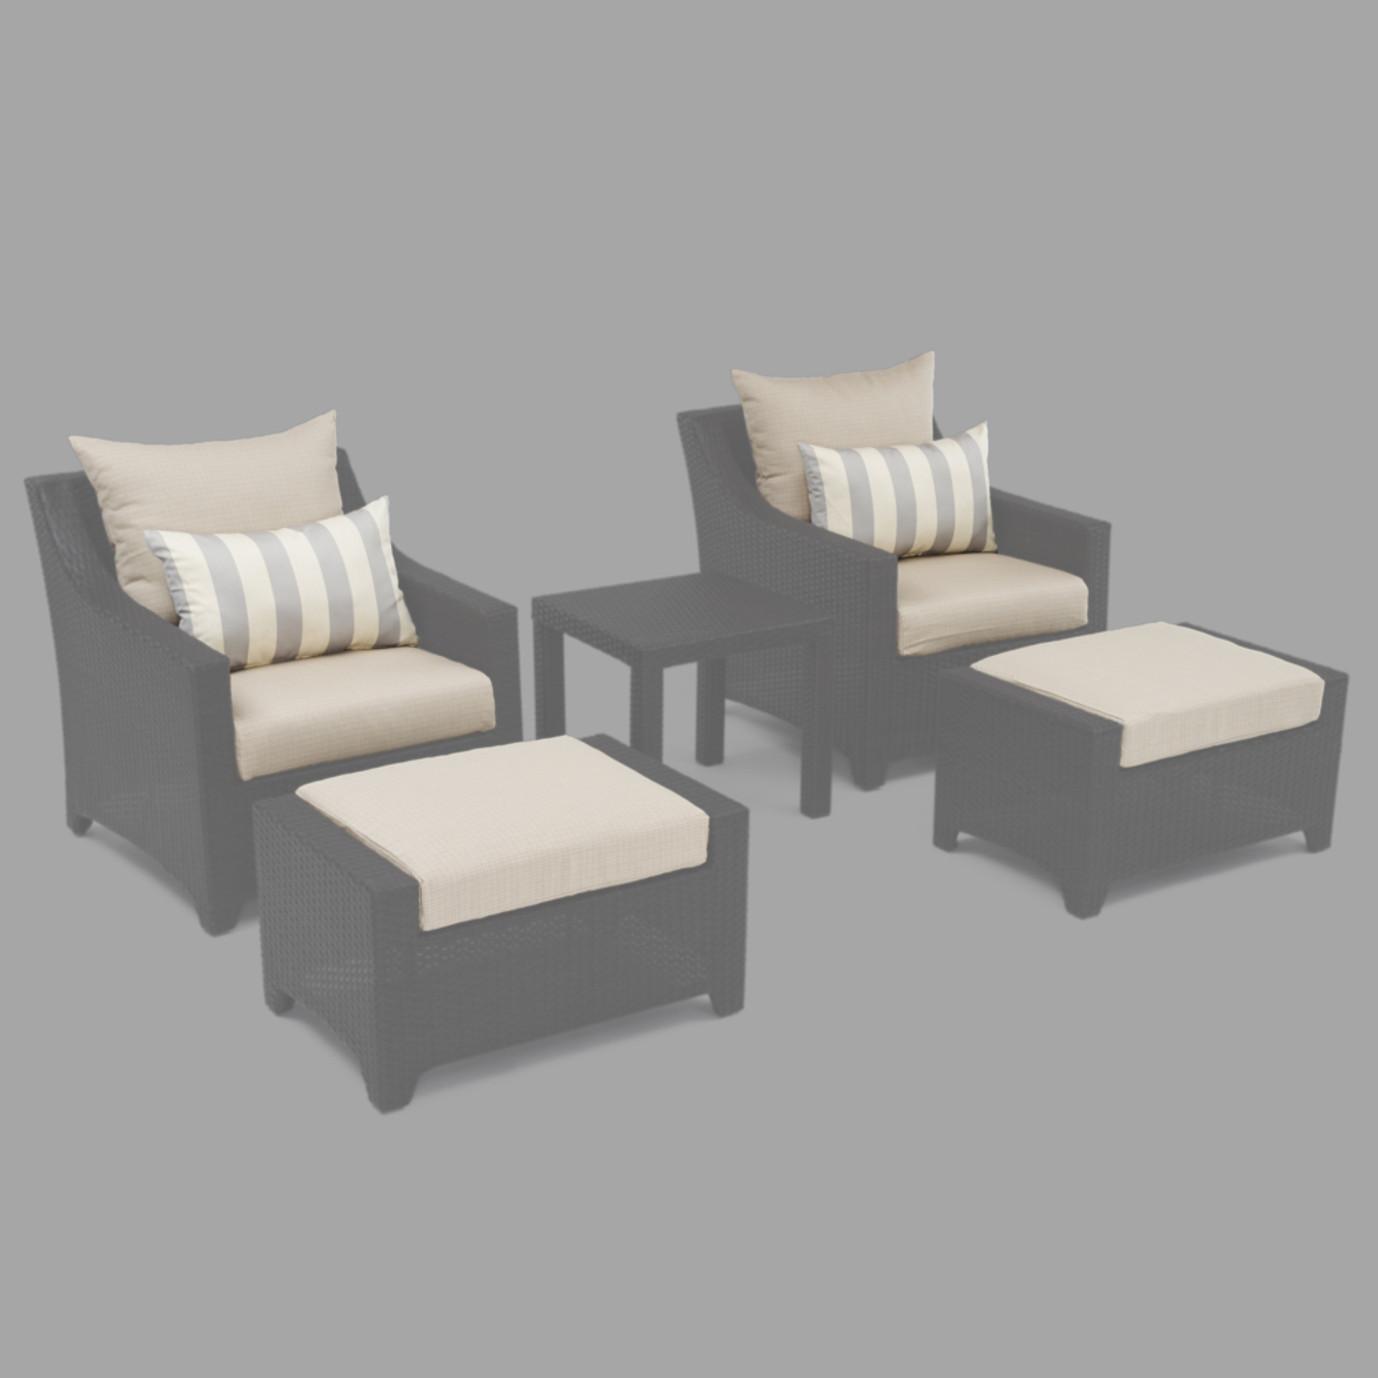 Modular Outdoor 5 Piece Club Cushion Cover Set - Slate Grey